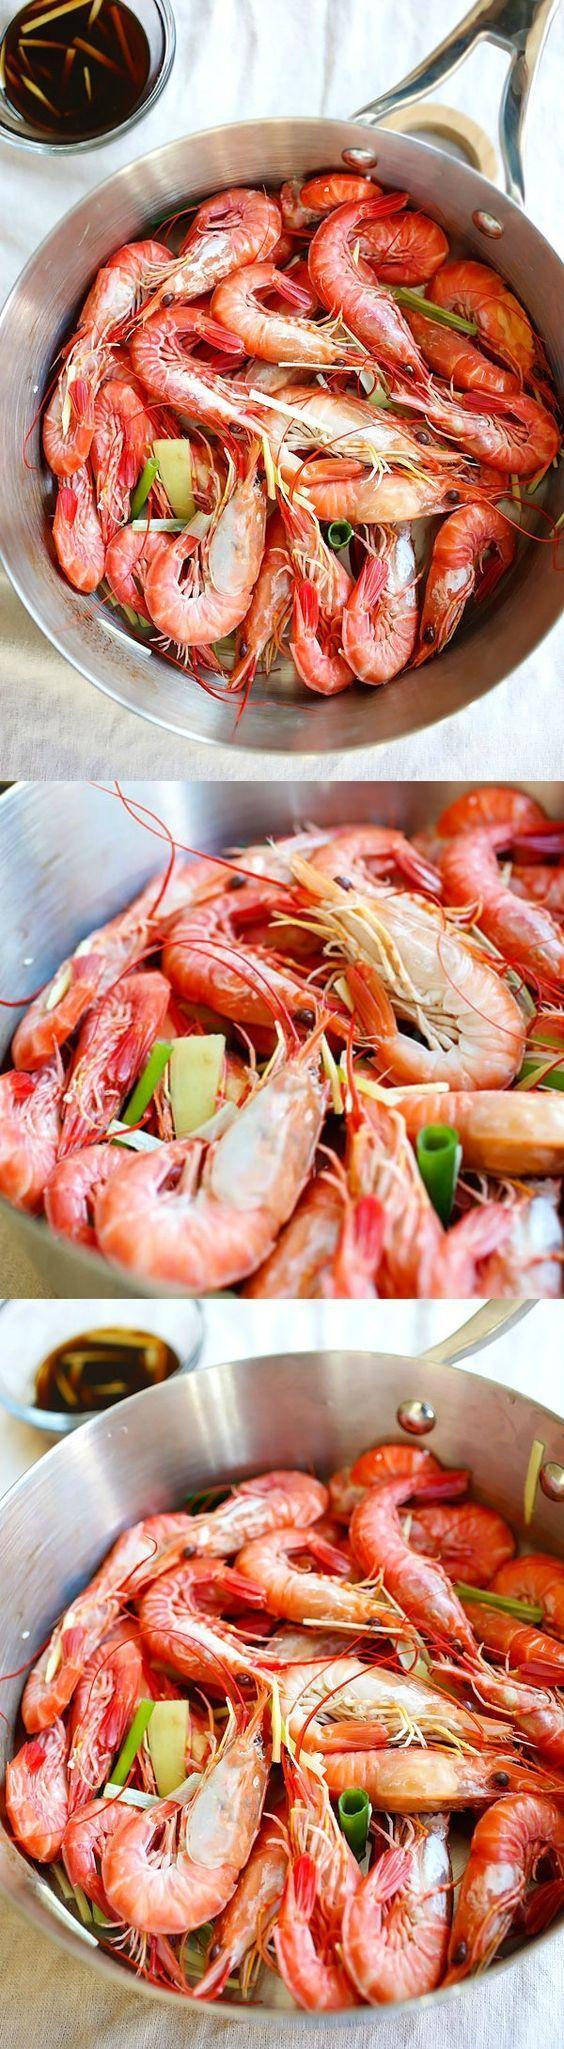 White Boiled Shrimp - Rasa Malaysia #boiledshrimp White boiled shrimp – a classic Hong Kong recipe where shrimp are boiled and served with a soy ginger sauce | rasamalaysia.com #boiledshrimp